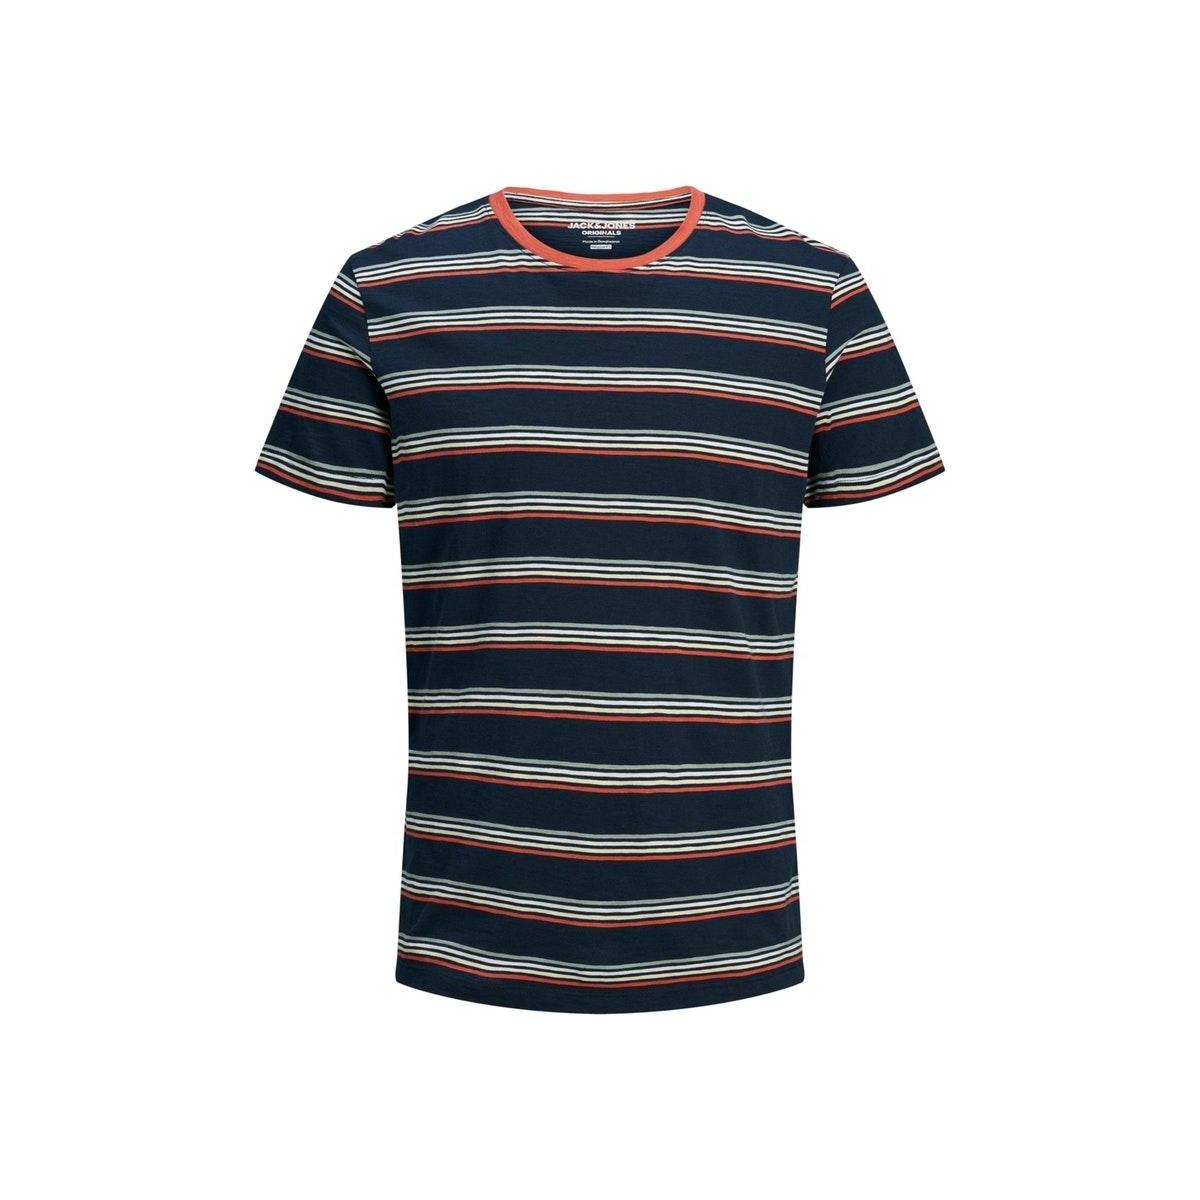 jorbobbi organic tee ss crew neck 12172001 jack & jones t-shirt navy blazer/slim